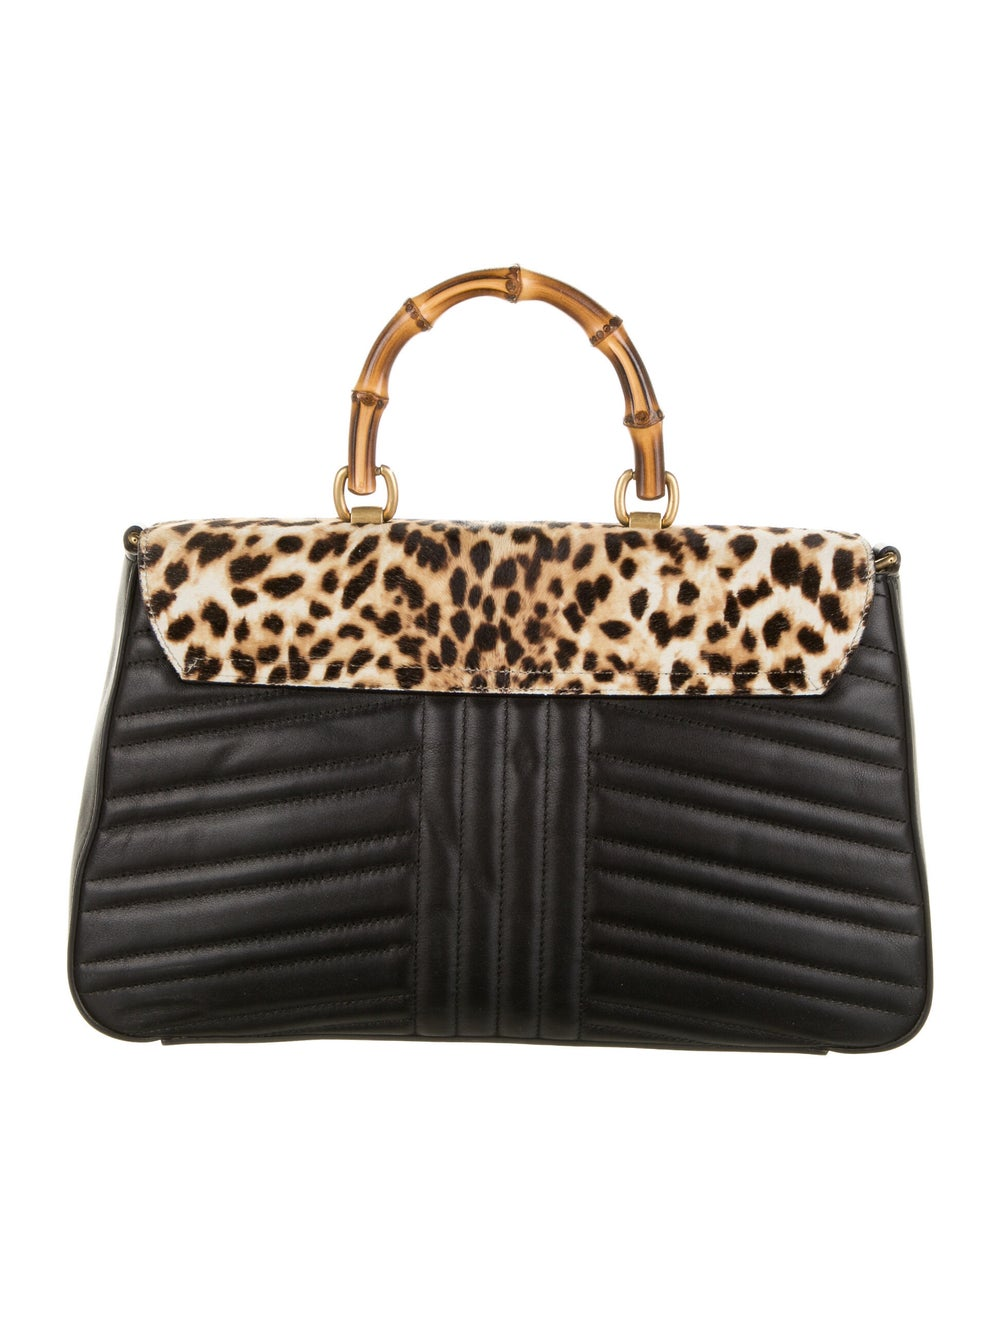 Gucci Bamboo Leopard Top Handle Bag Black - image 4